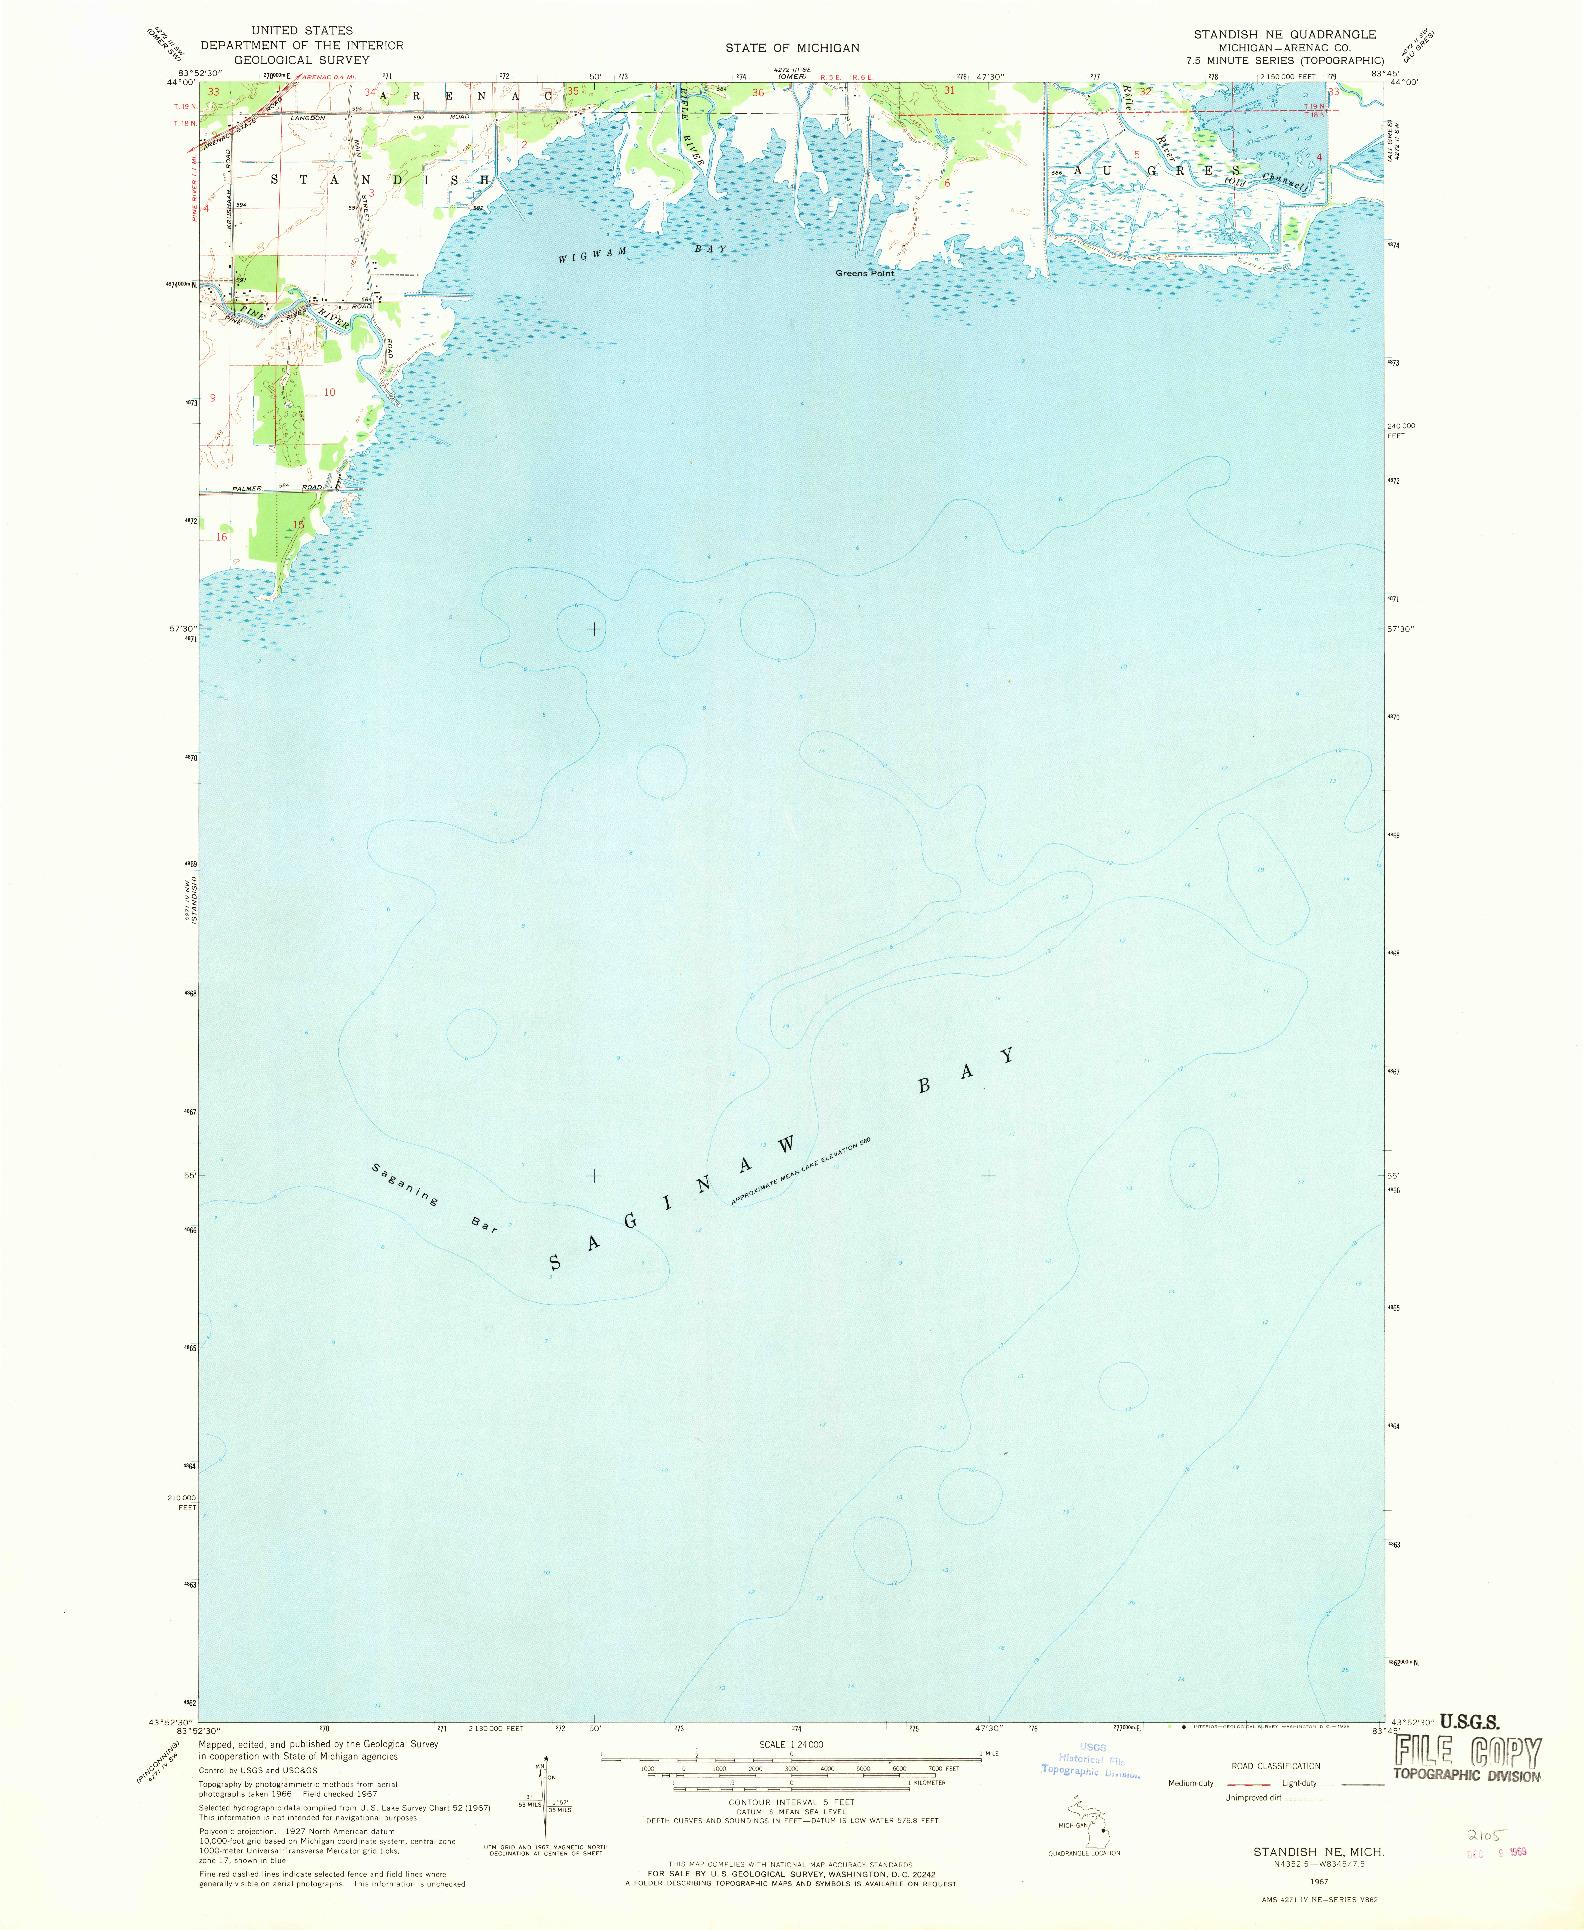 USGS 1:24000-SCALE QUADRANGLE FOR STANDISH NE, MI 1967